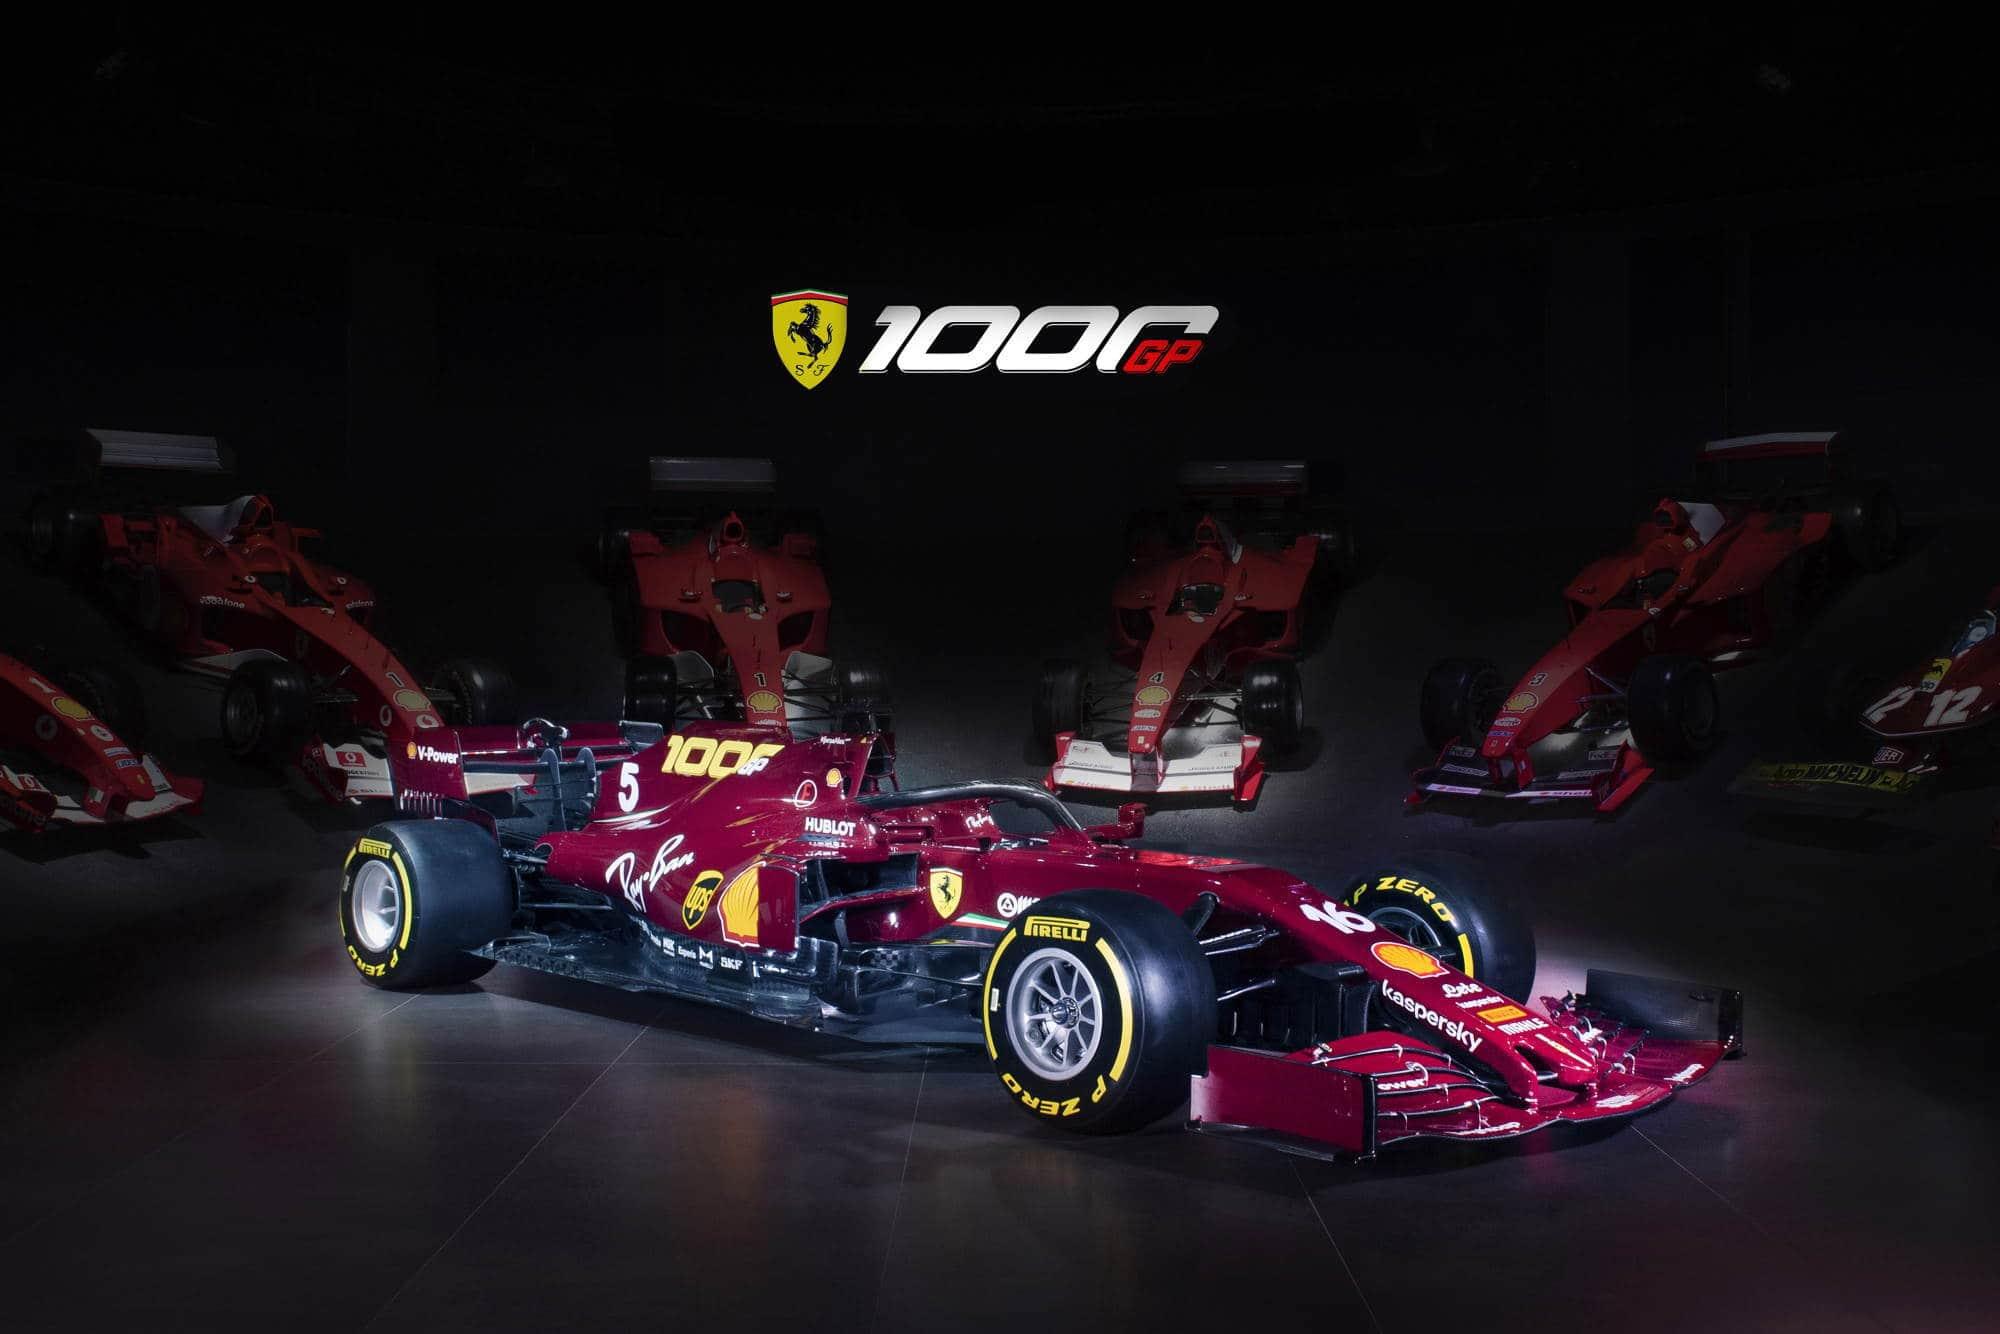 2020 Tuscan GP Ferrari SF1000 special livery Photo Ferrari